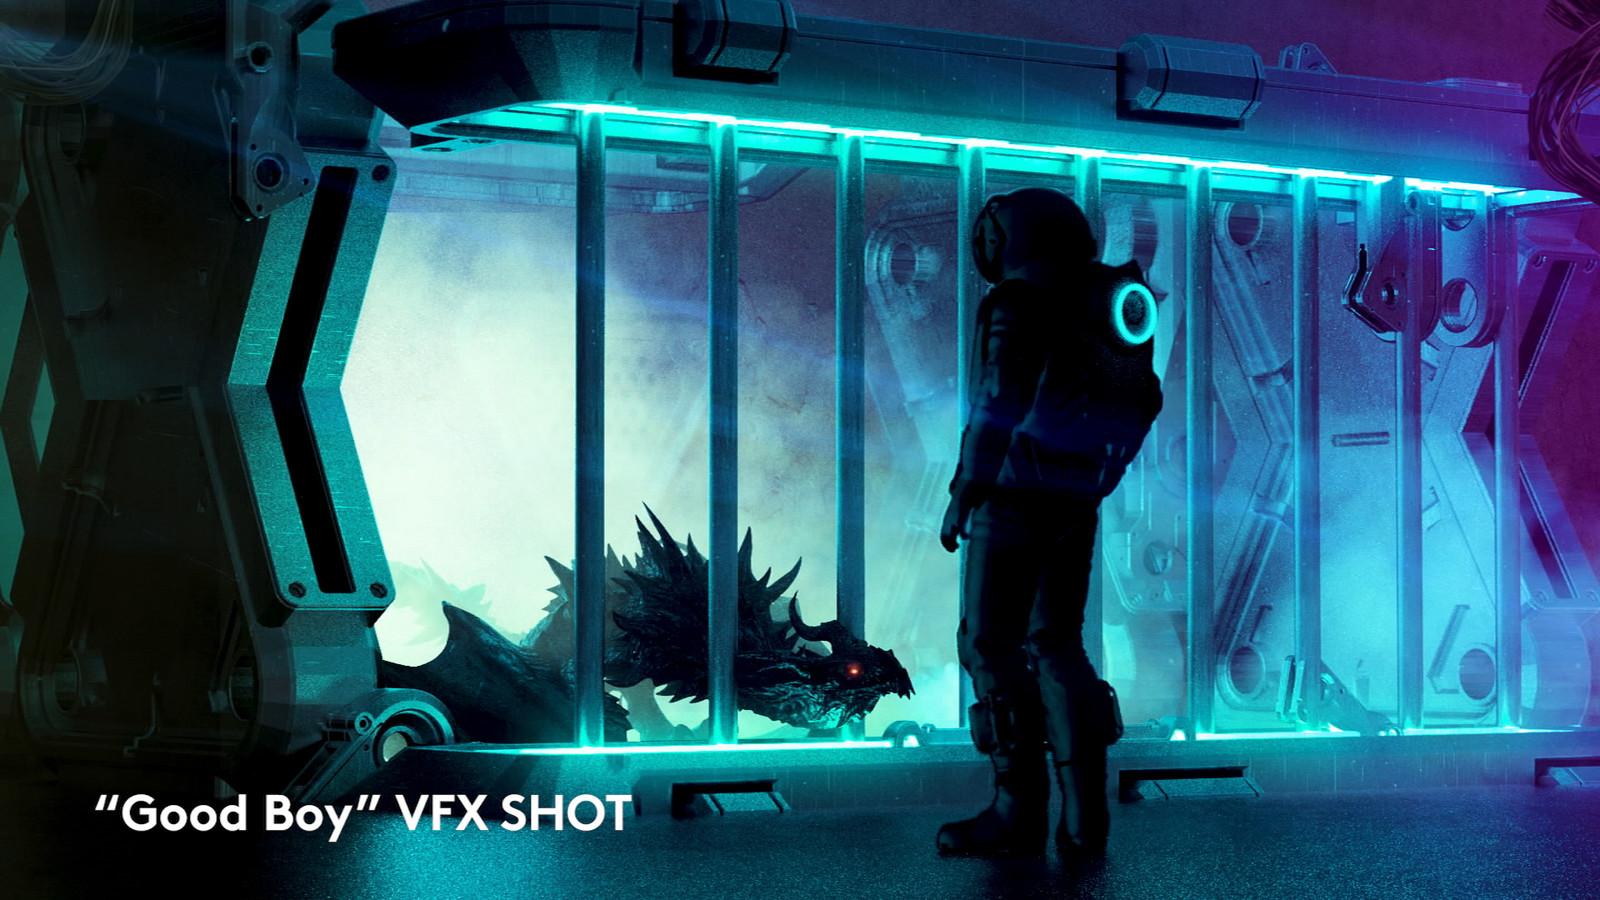 """Good Boy"" VFX SHOT BREAKDOWN"